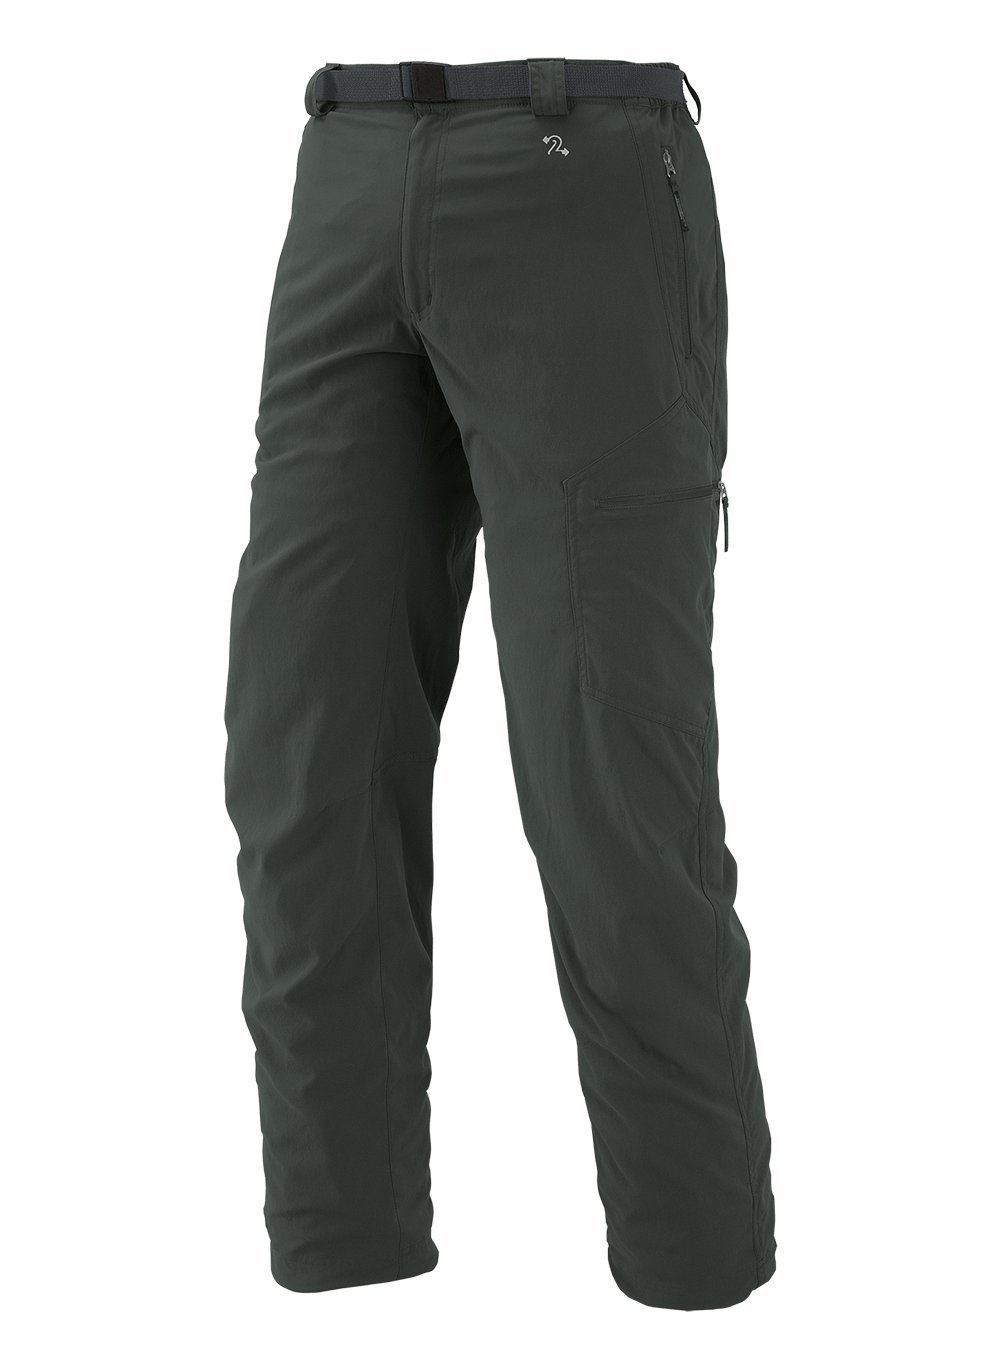 Myroh Trangoworld Xl Pantalones Largos Amazon Hombre Verde kaki Fi dHpHwORqWr